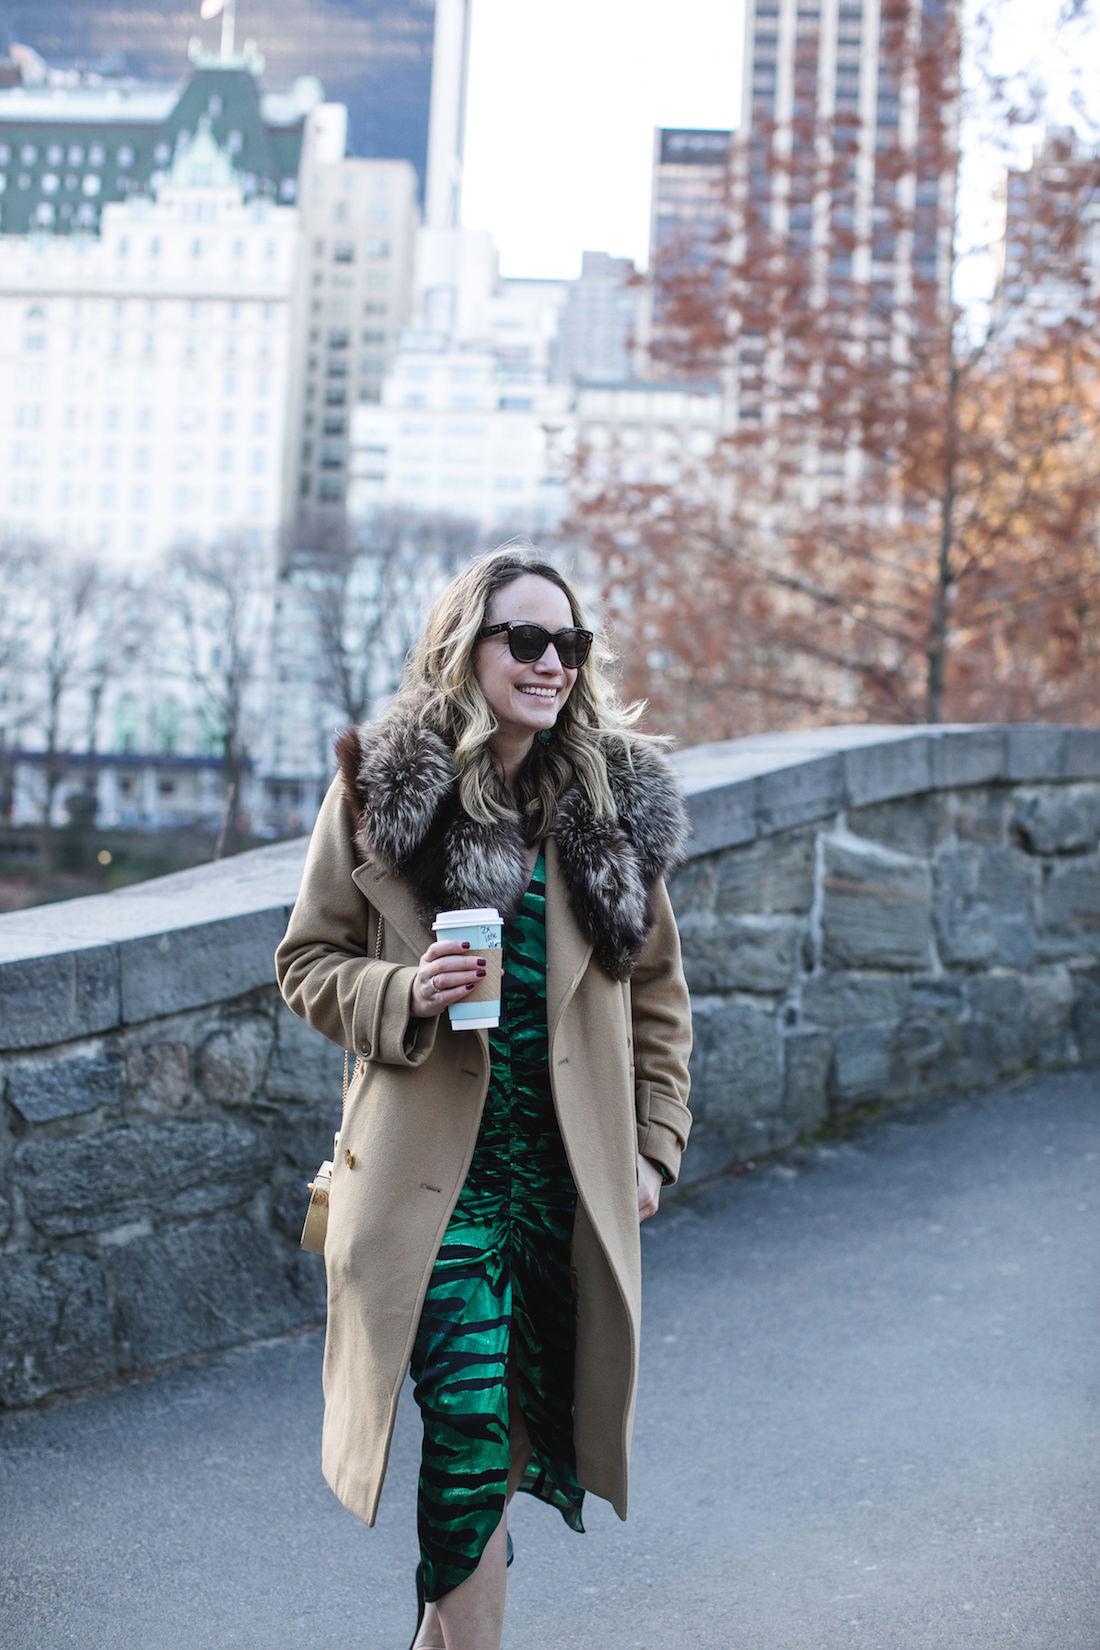 Outfit Details:Old Vince Coat / Vintage Fur // Topshop Dress //  Kendra Scott Earrings // Polaroid Sunglasses